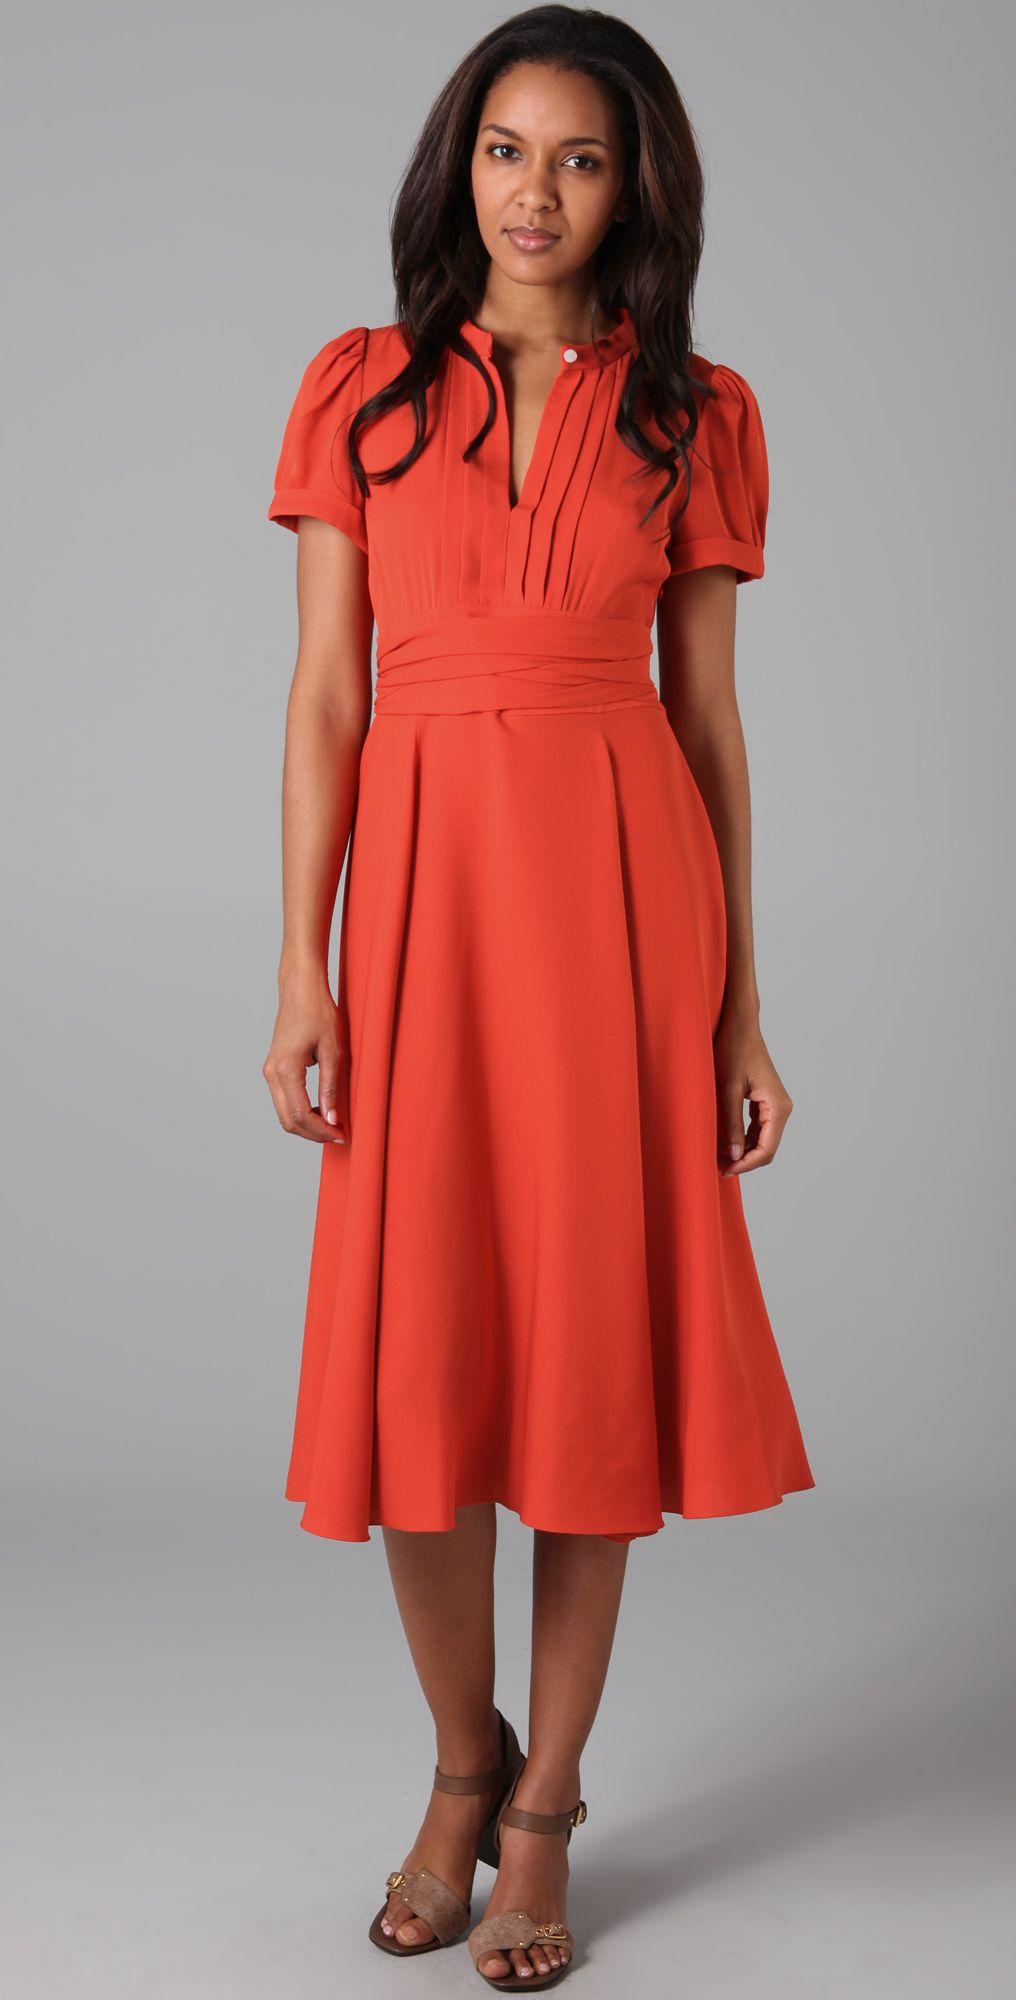 8e444f28f0de Marc By Marc Jacobs Silk Crepe  Mimi  Short Sleeve Dress